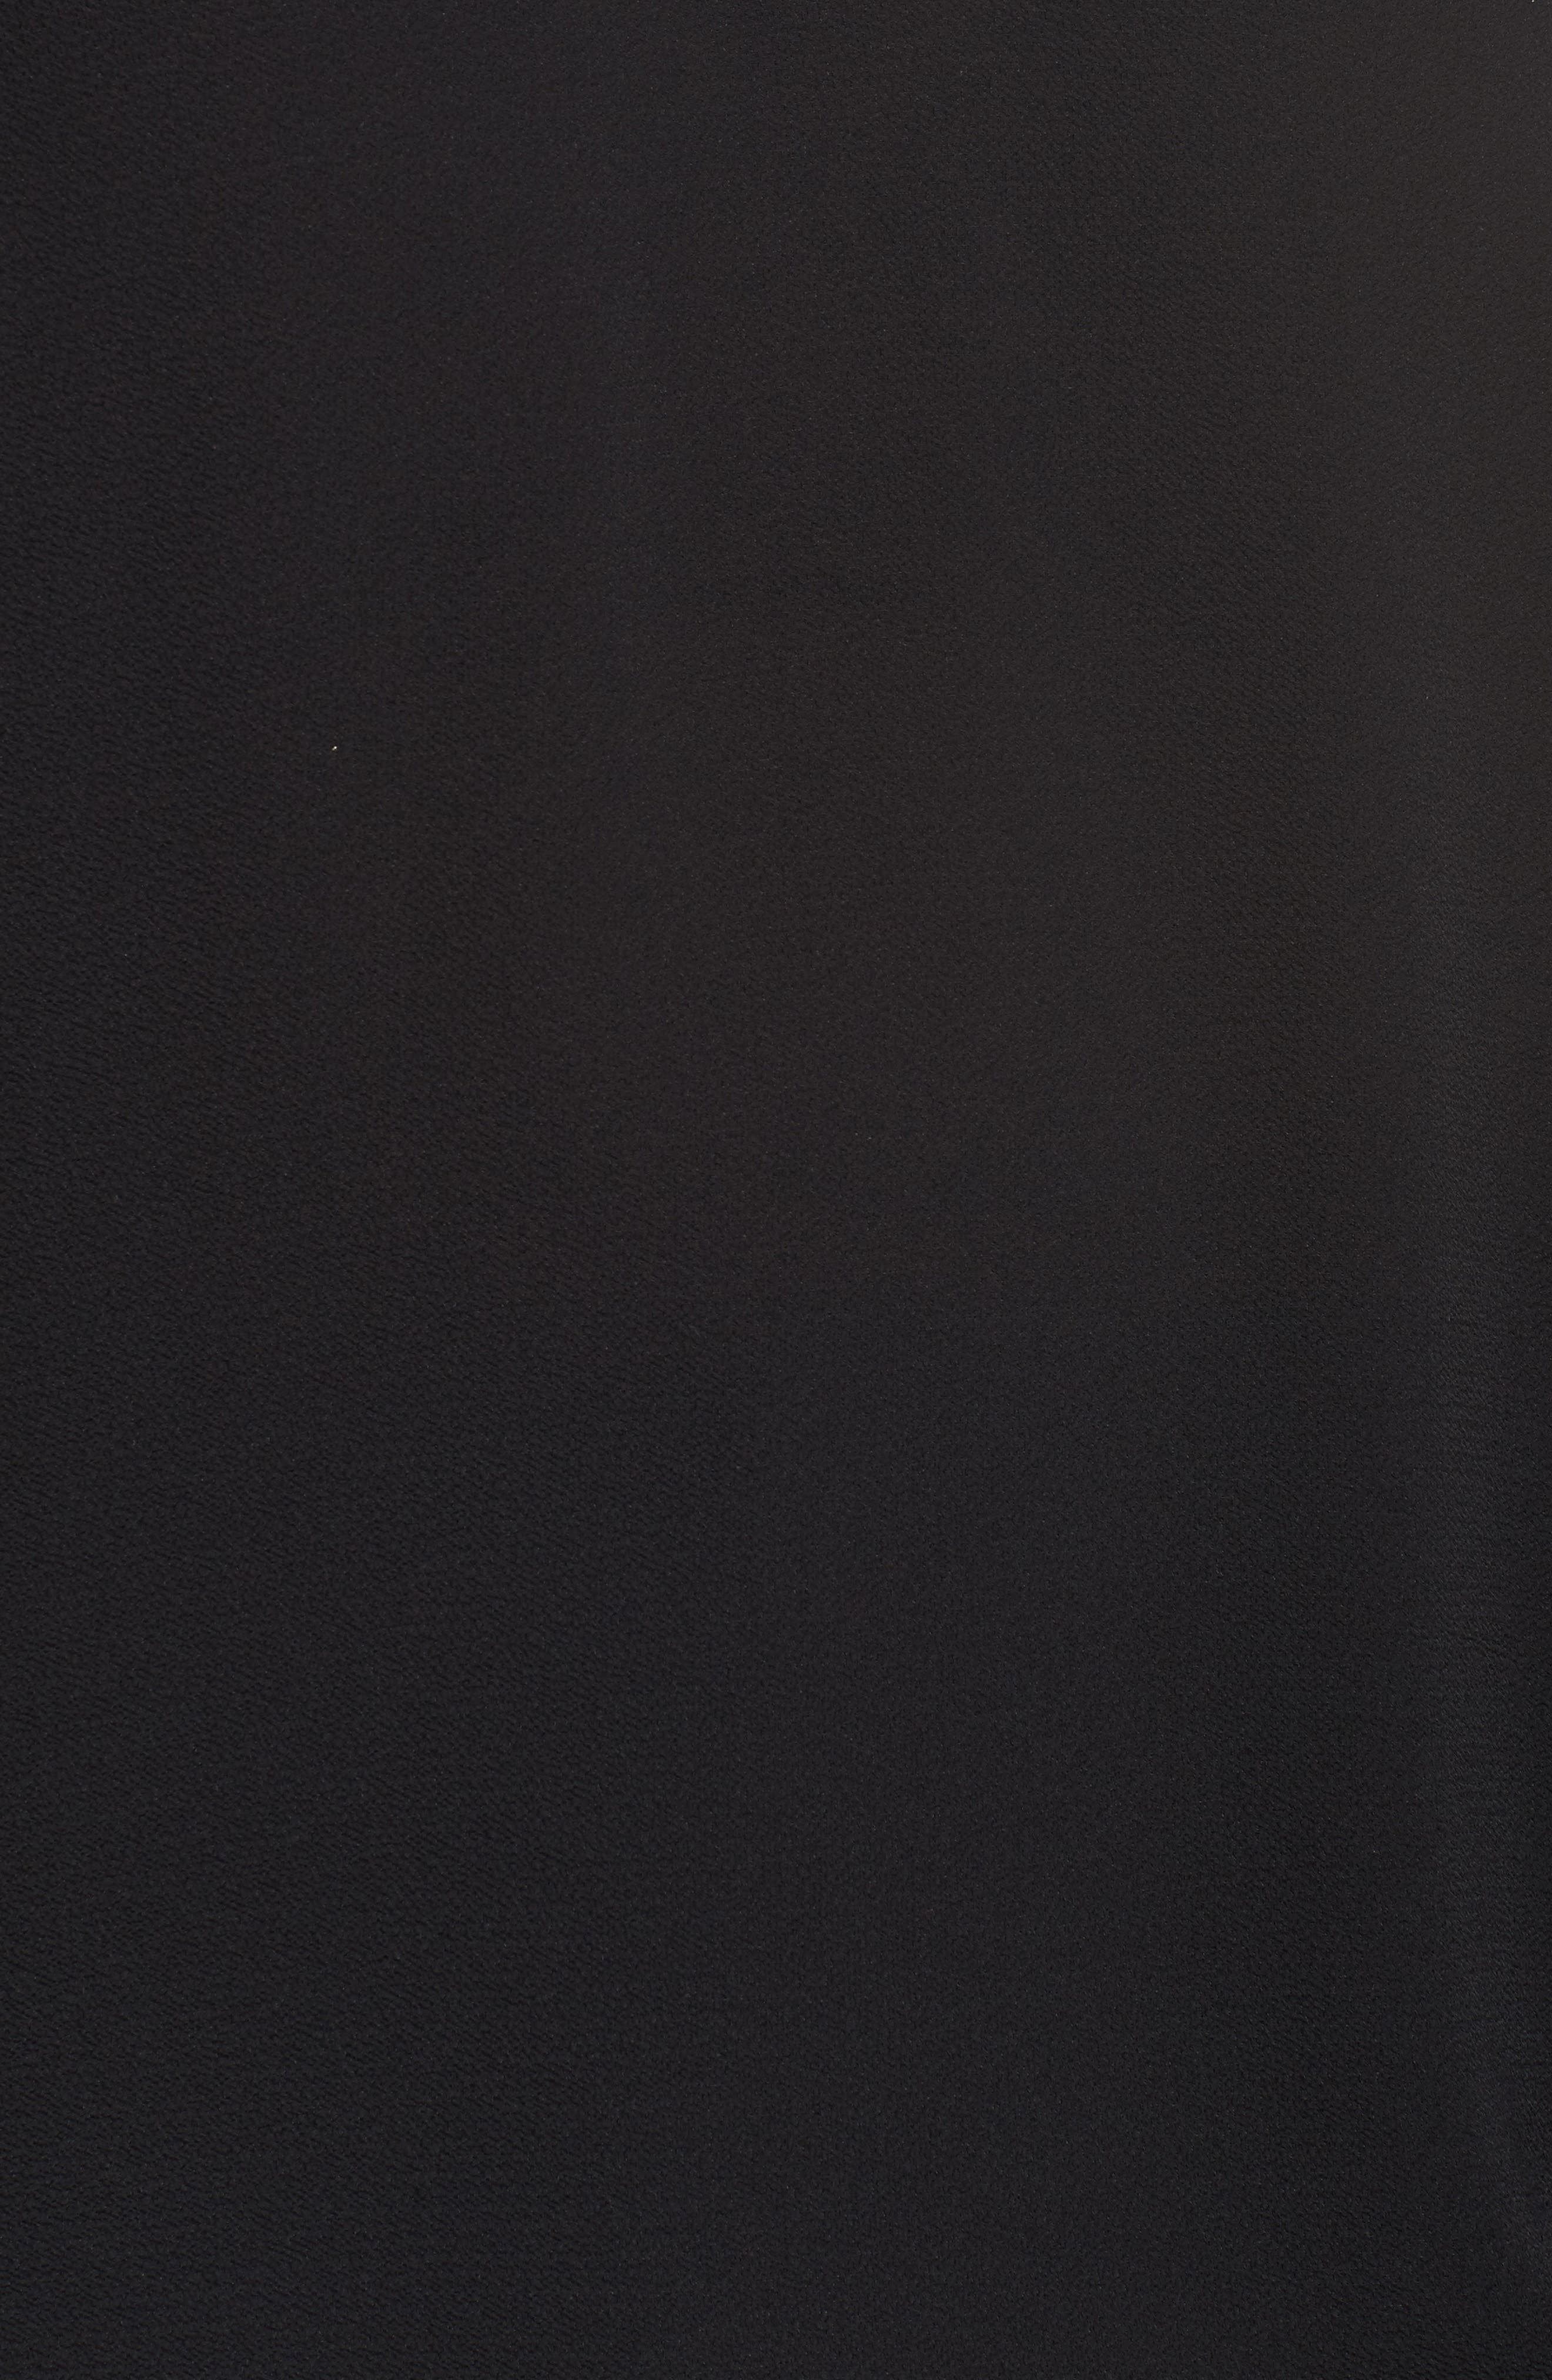 Bell Sleeve Tunic,                             Alternate thumbnail 5, color,                             Black